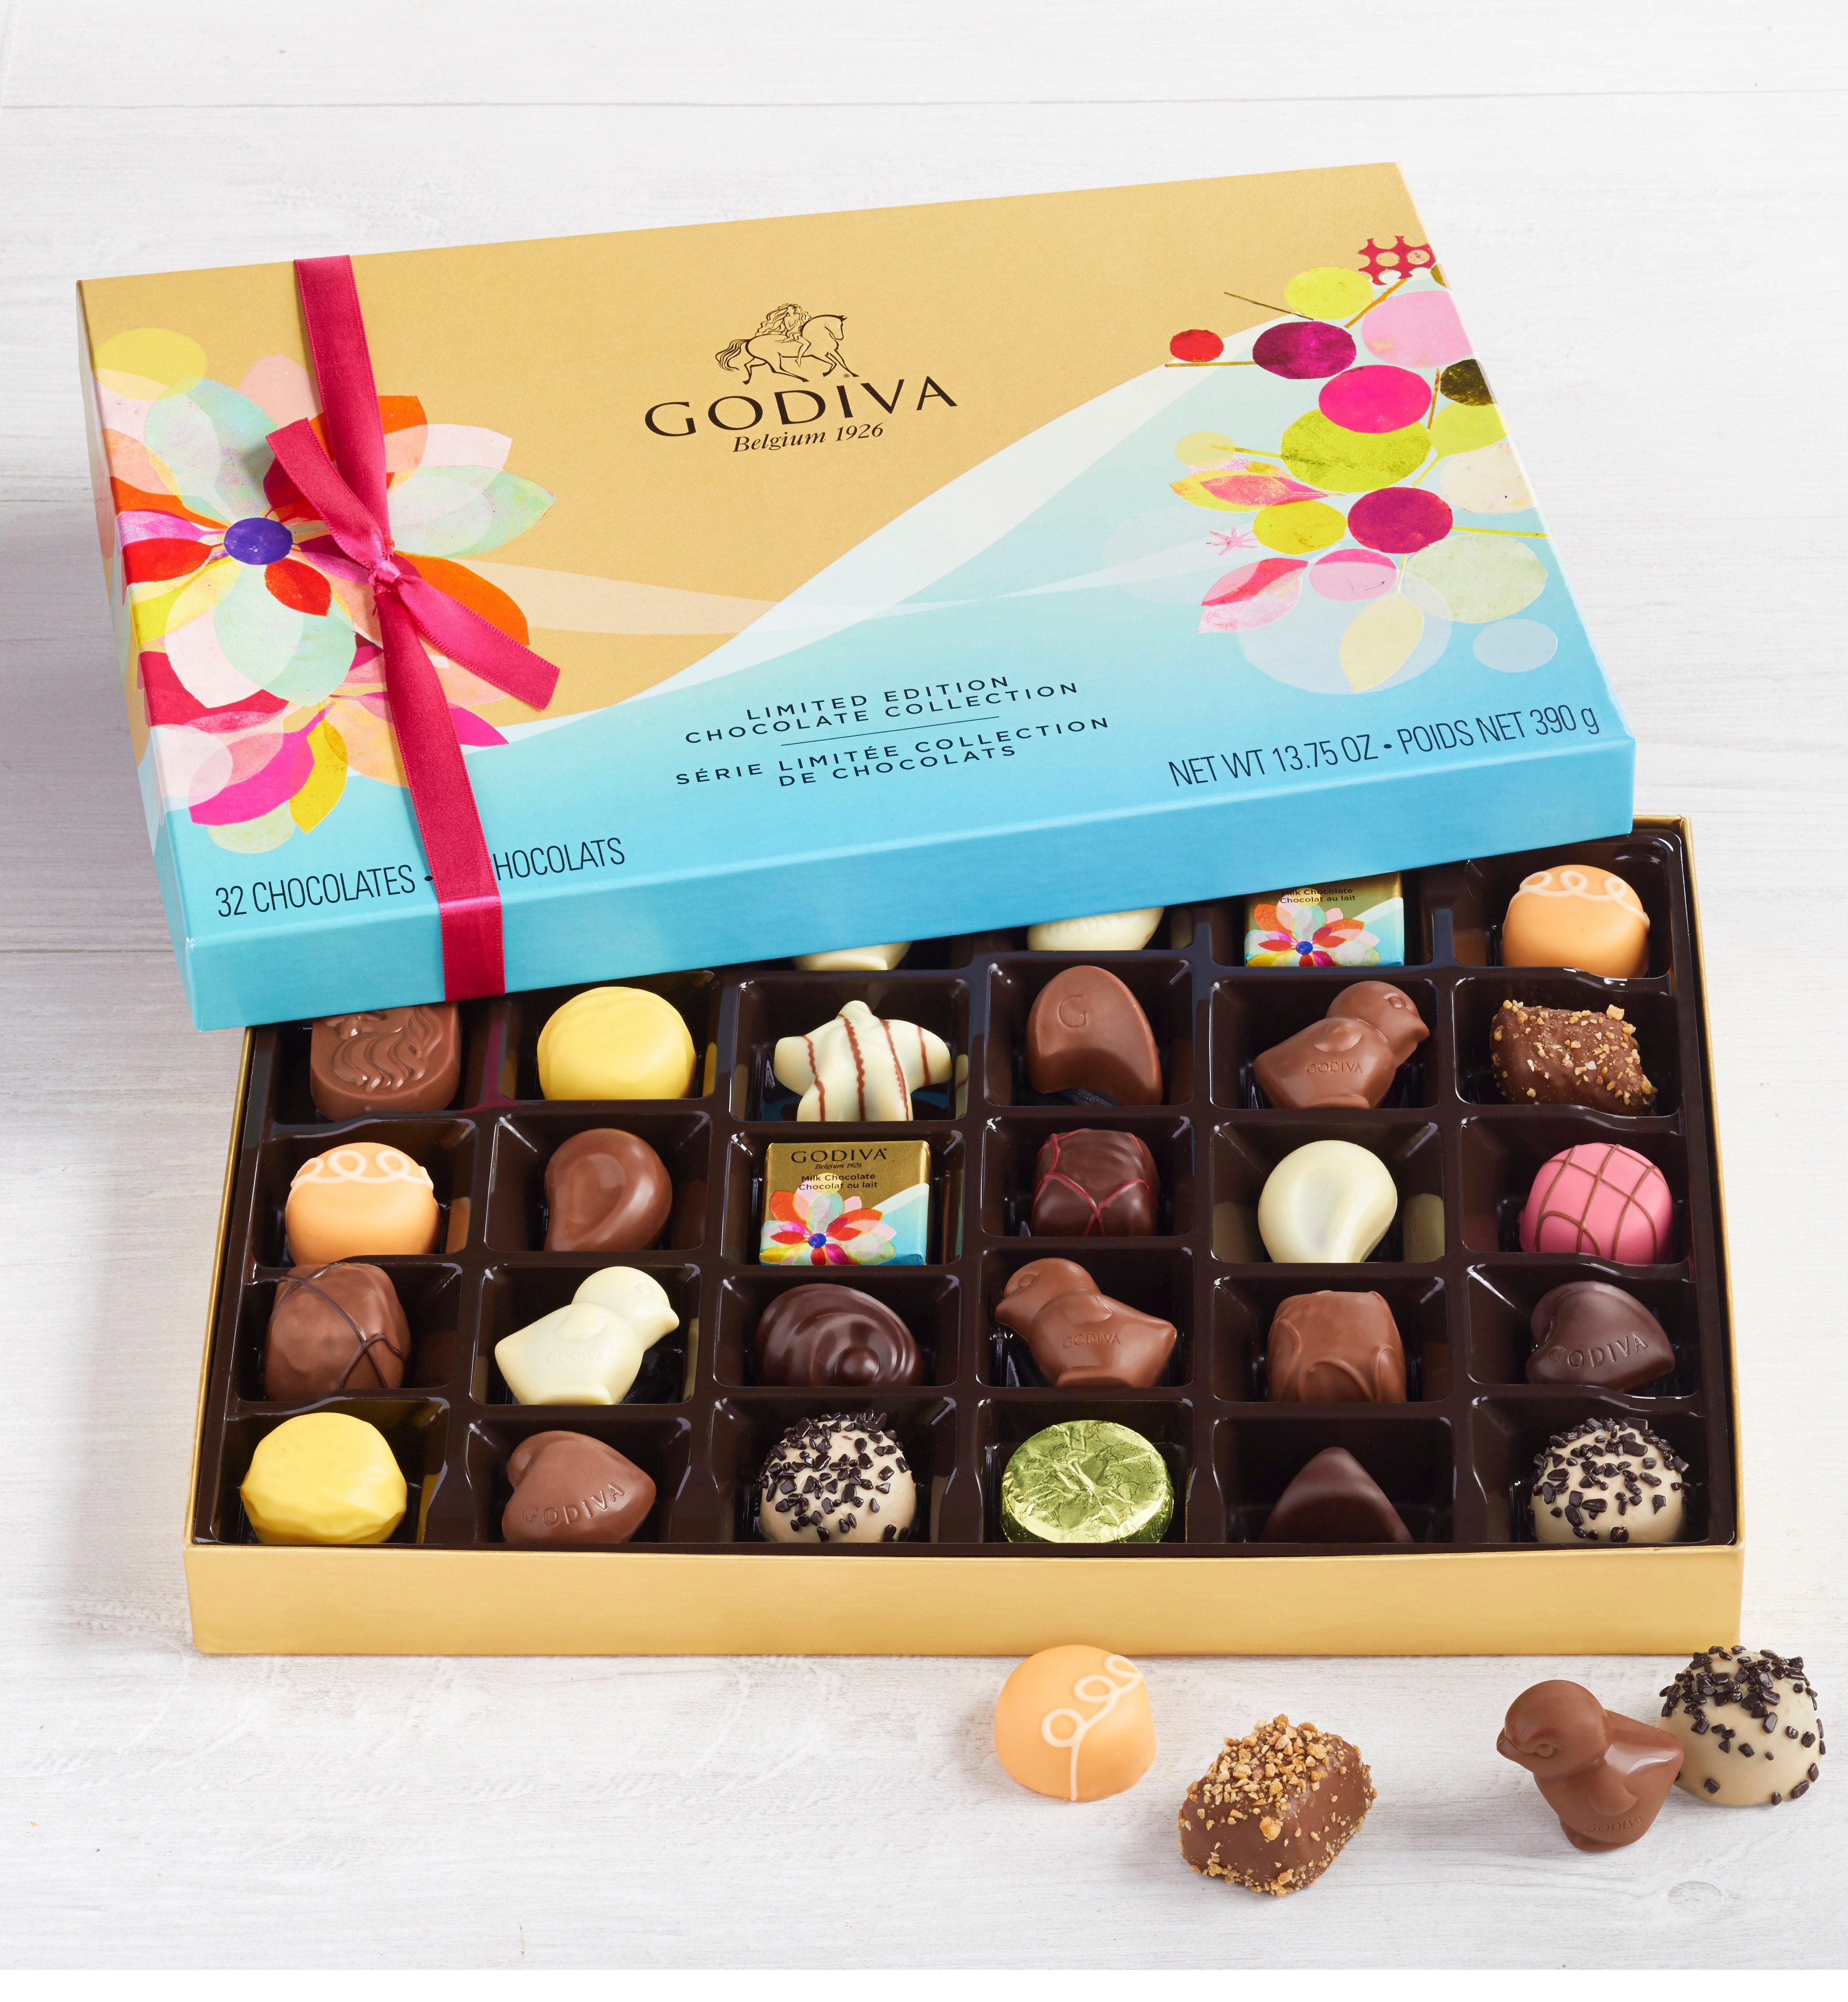 Godiva pc Limited Edition Spring Chocolates Box